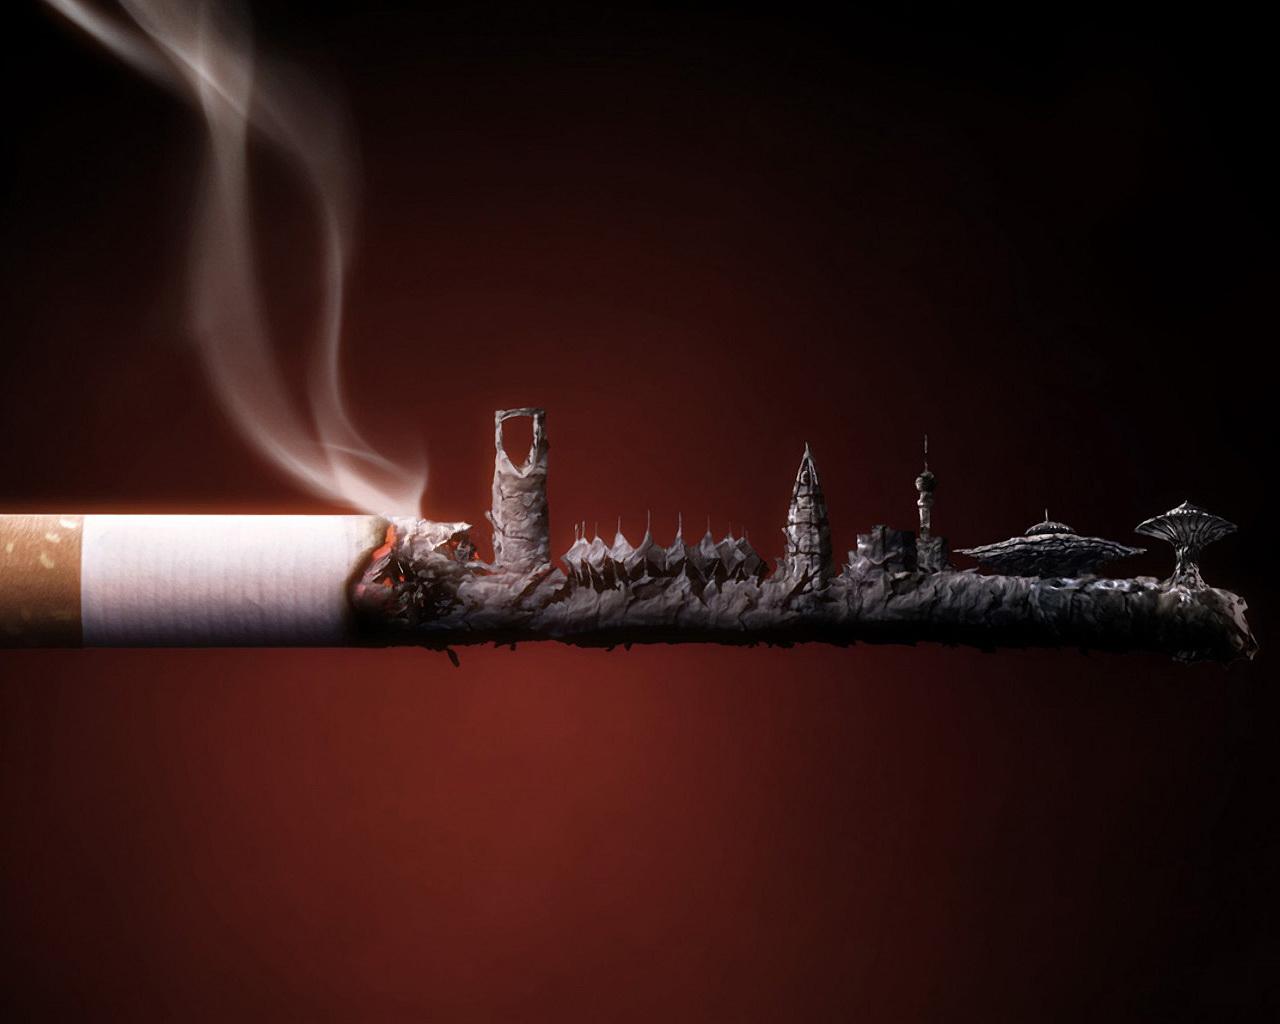 http://1.bp.blogspot.com/-8QW5P7Zhgpc/T61iouBpqFI/AAAAAAAAFSE/xXDyRAKkOFk/s1600/smoked-cigarette-wallpapers_8907_1280x1024.jpg